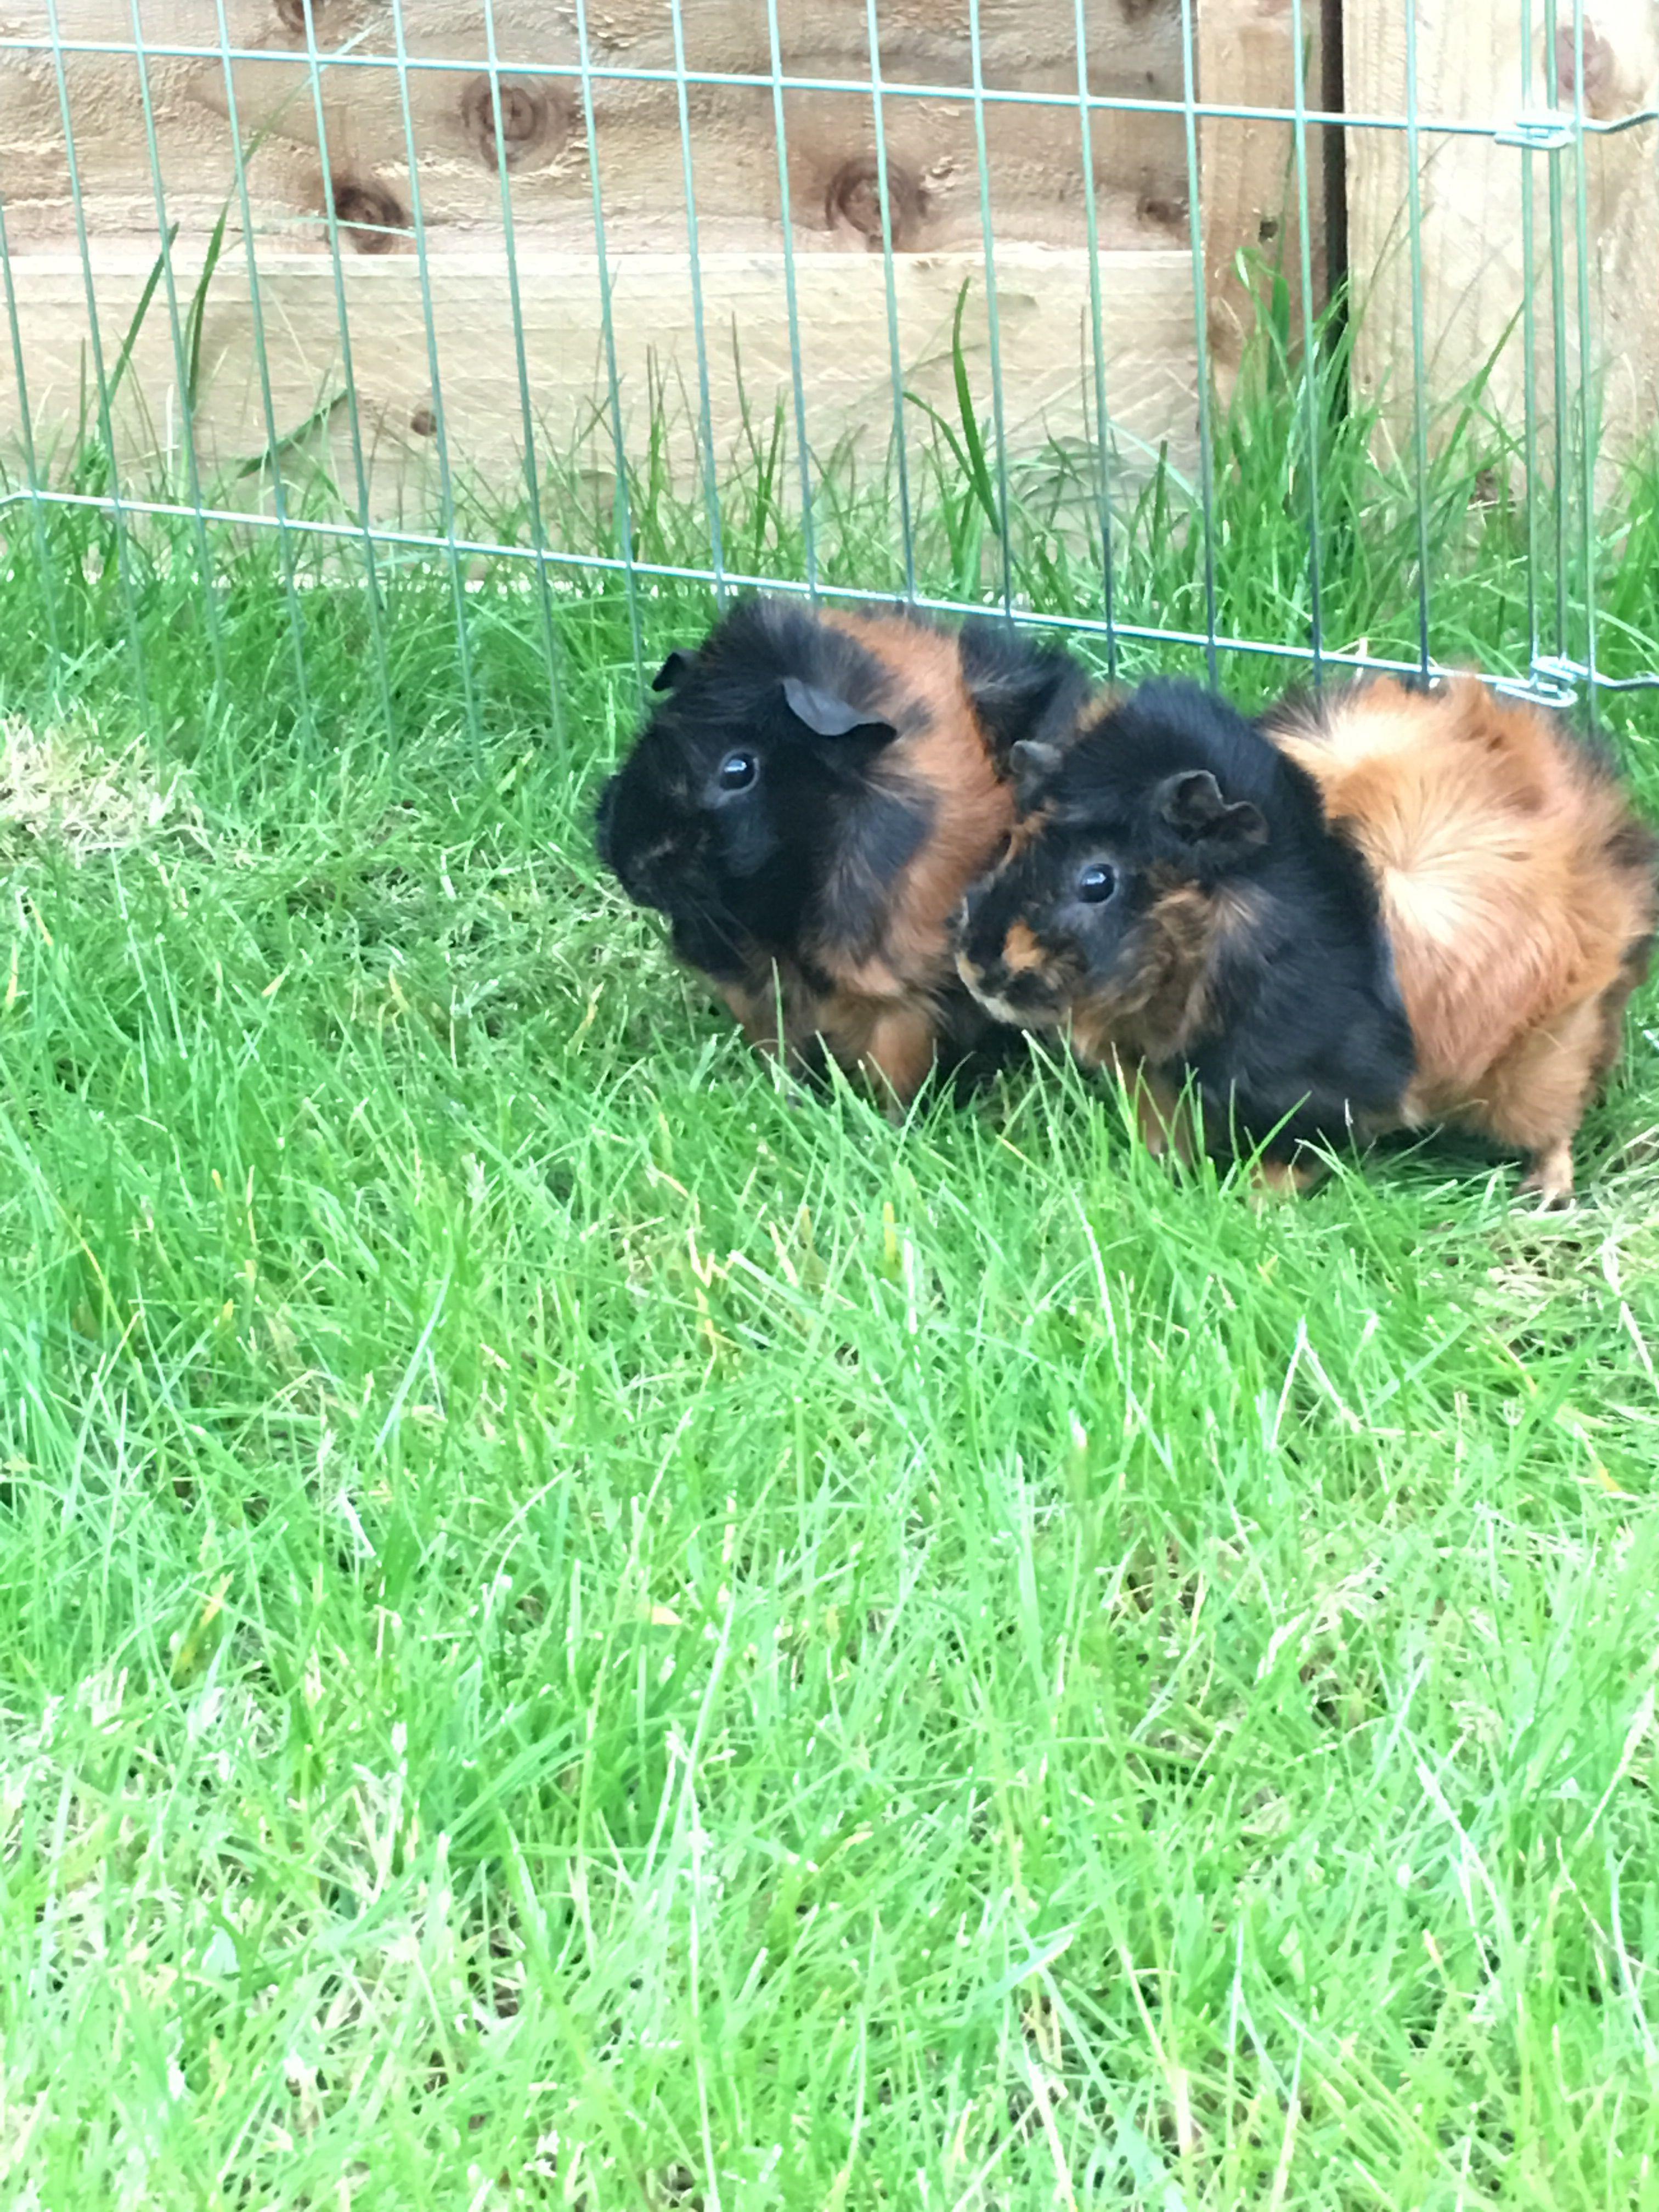 My 2 Guinea pigs